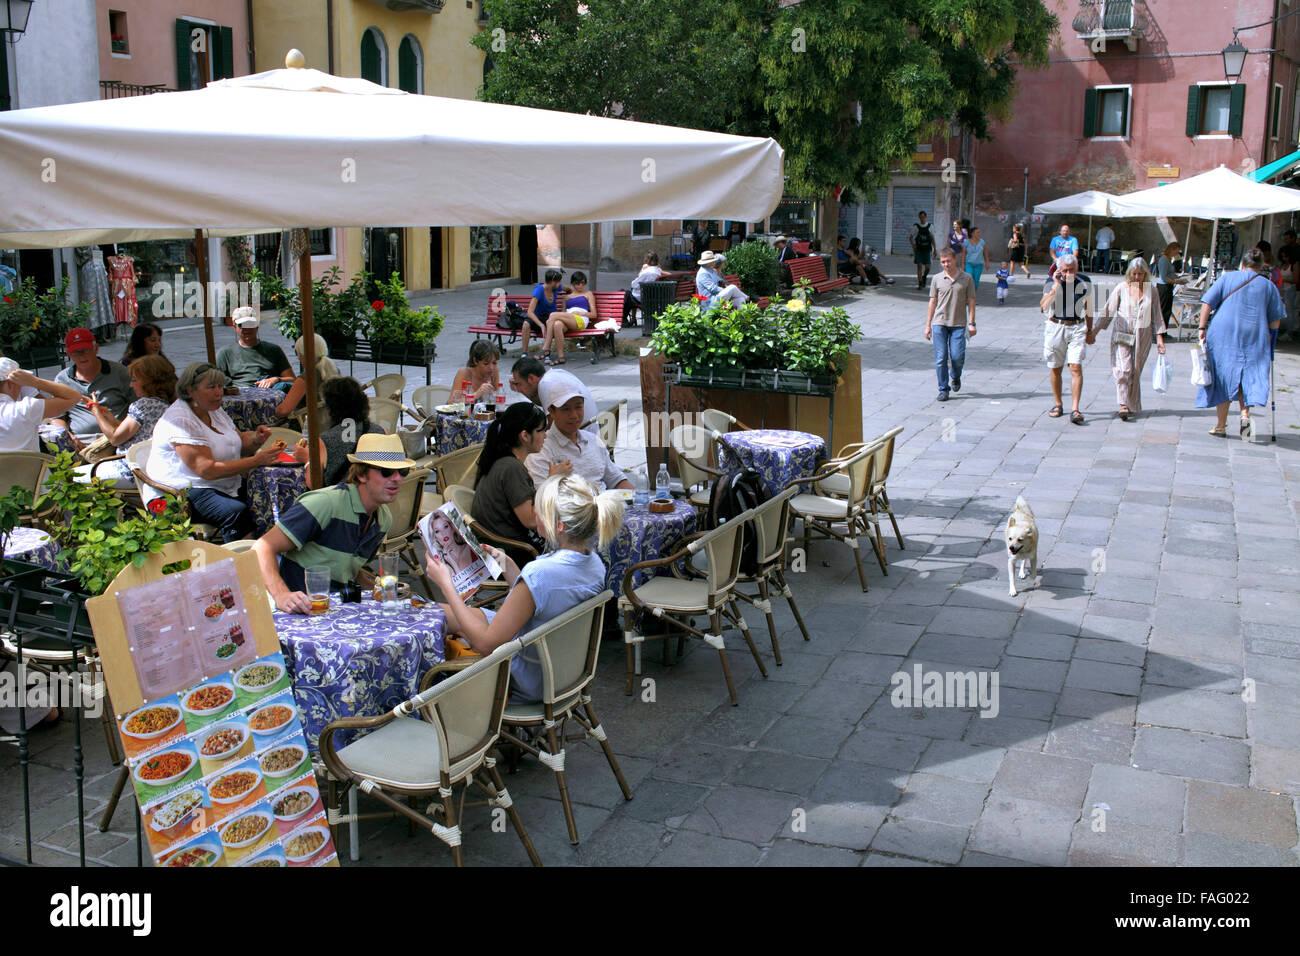 A restaurant in Campo Santa Maria Nova, a typical square  in car-free Venice. - Stock Image